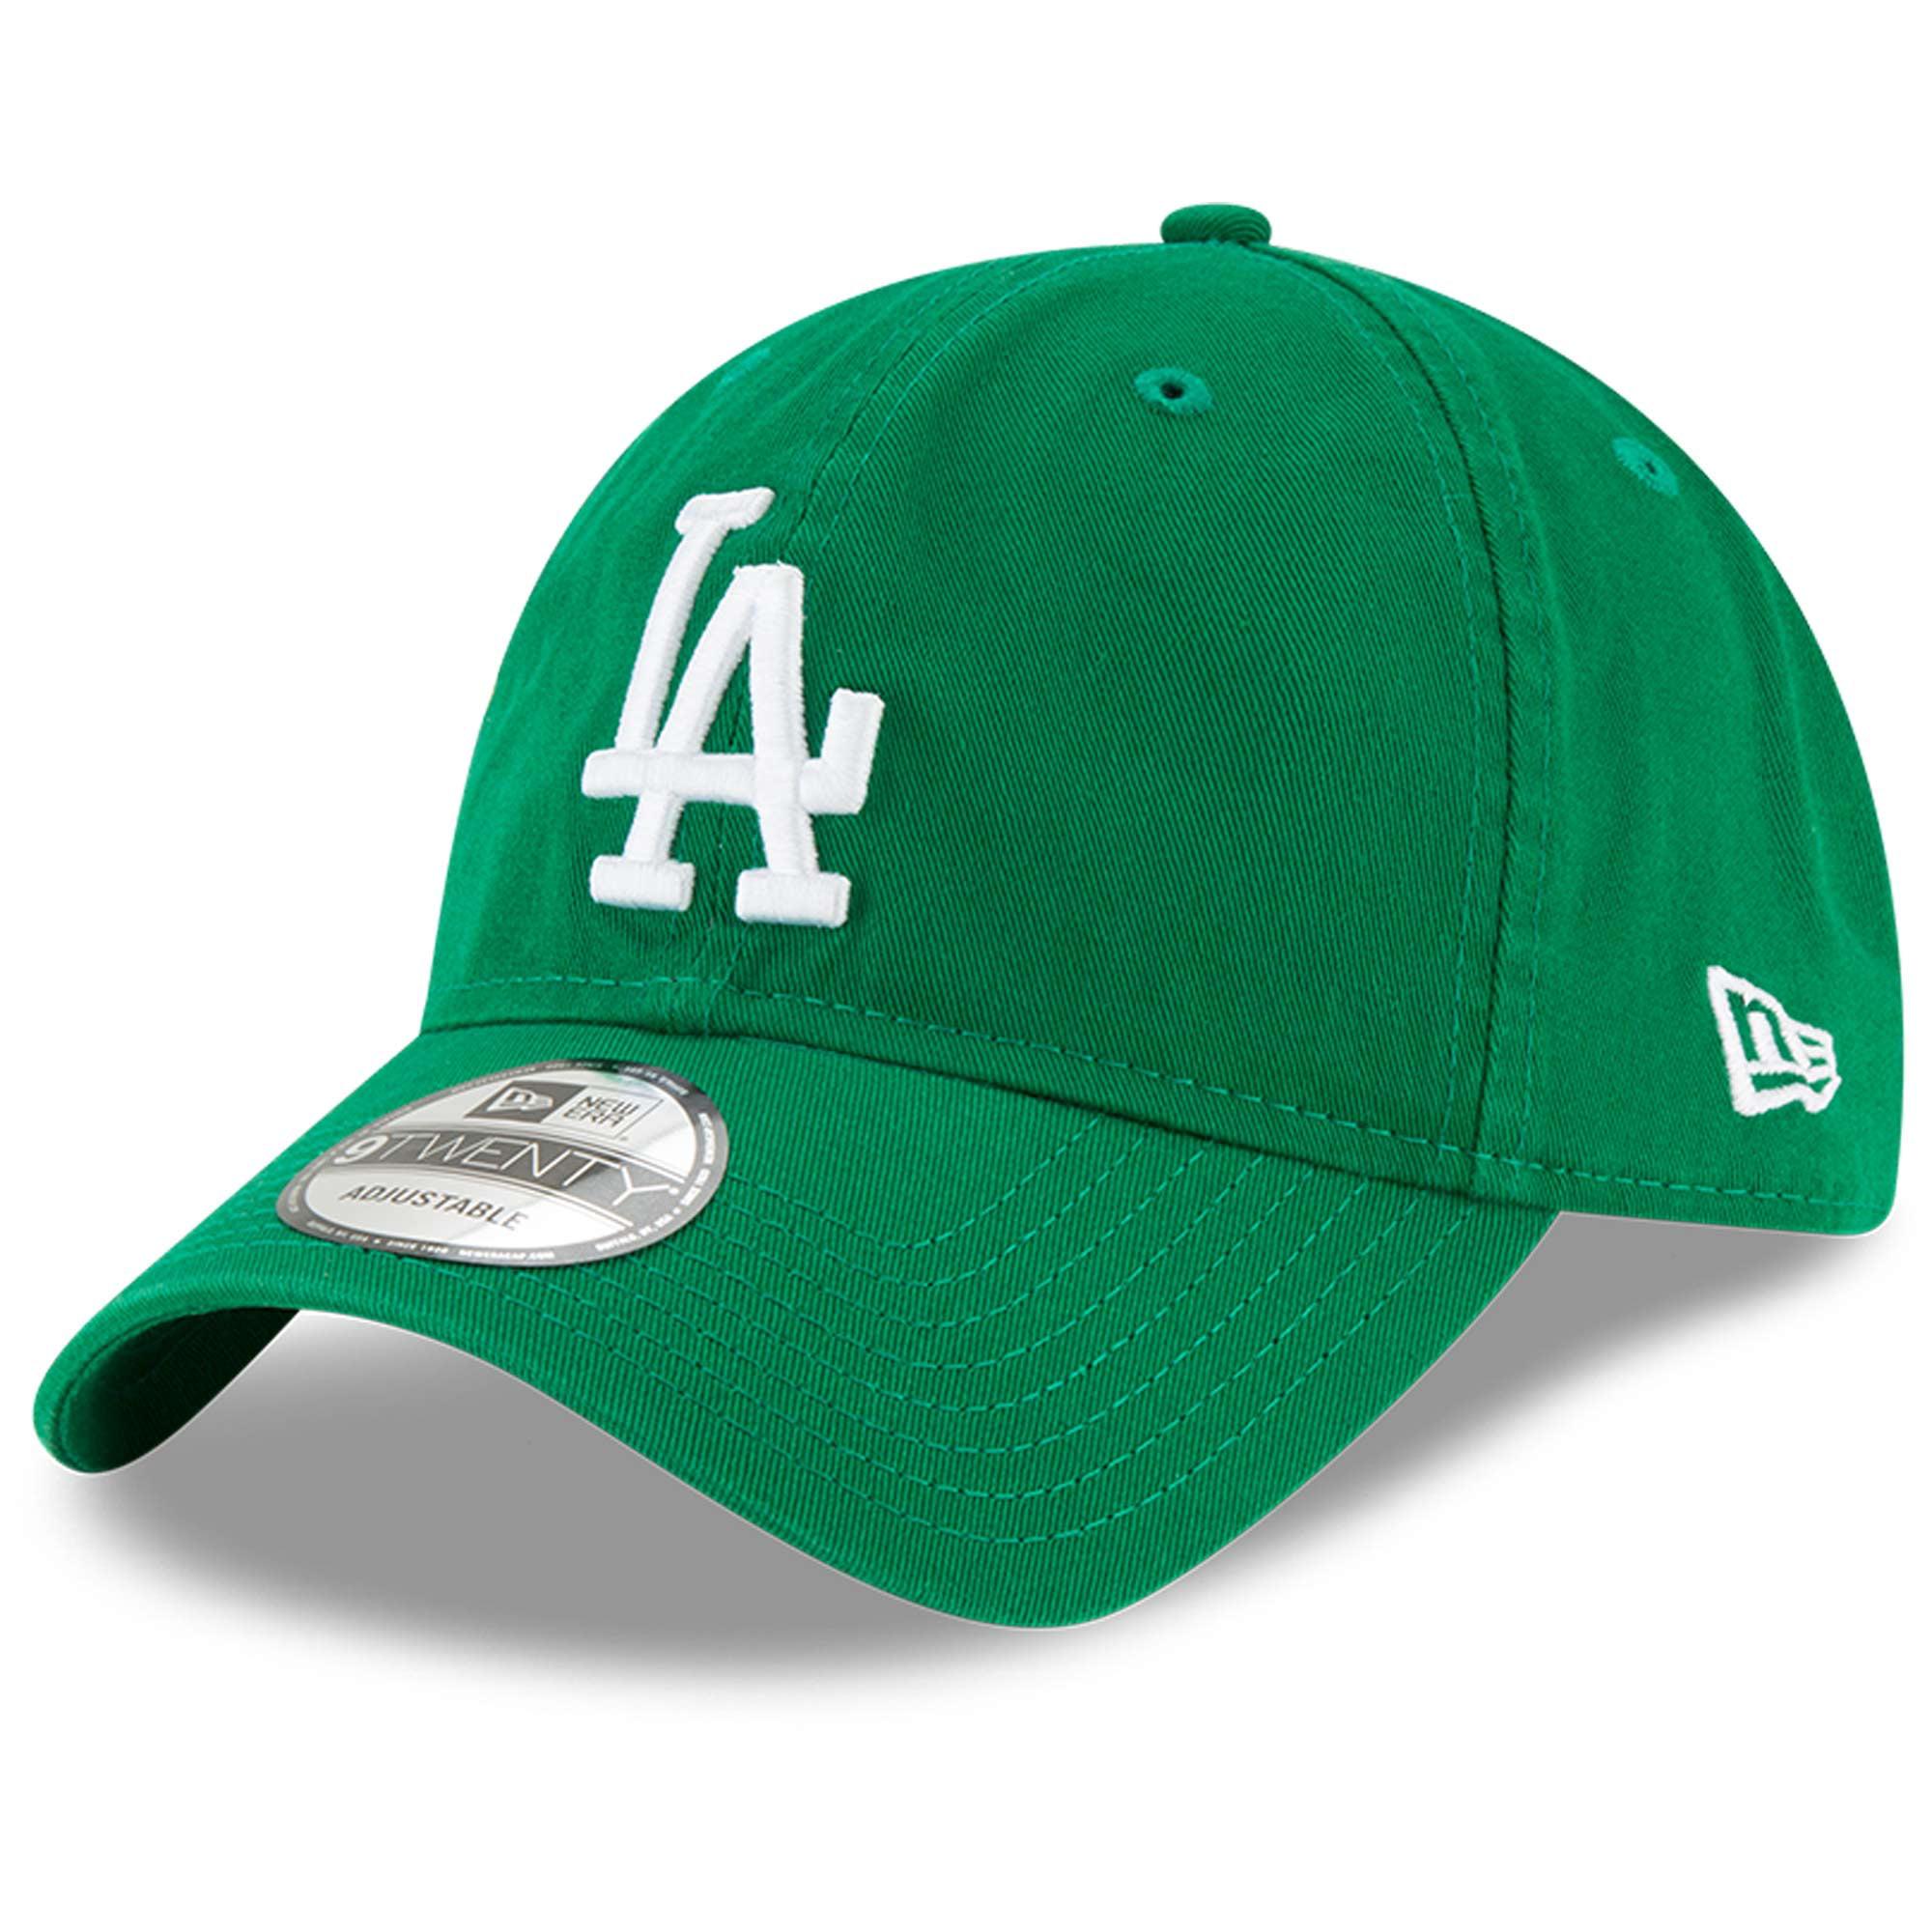 Los Angeles Dodgers New Era St. Patrick's Day Core Classic 9TWENTY Adjustable Hat - Green - OSFA